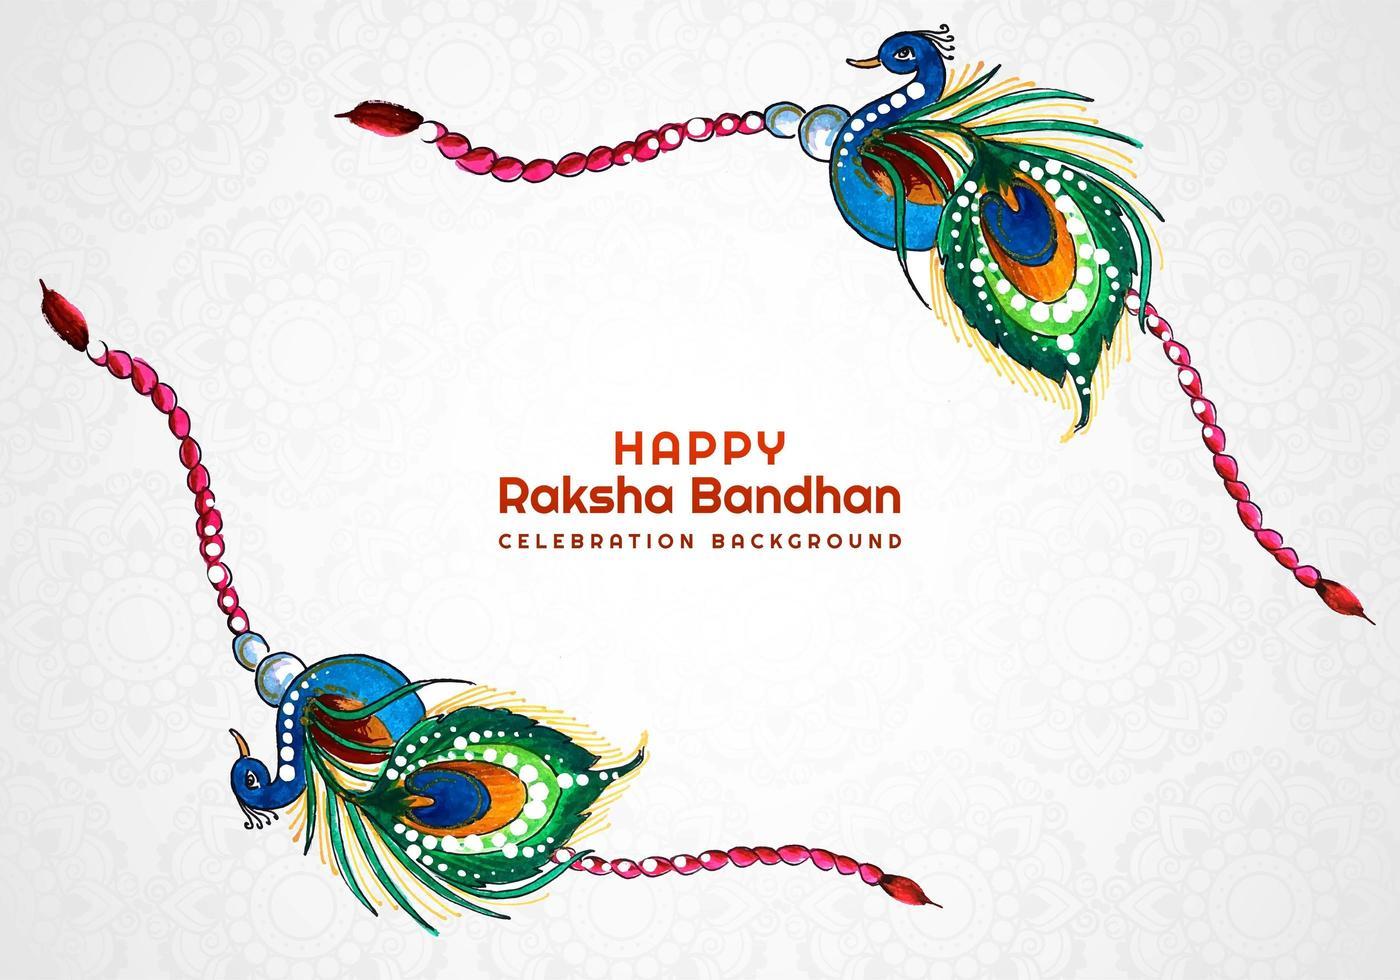 carta del braccialetto del pavone felice raksha bandhan vettore